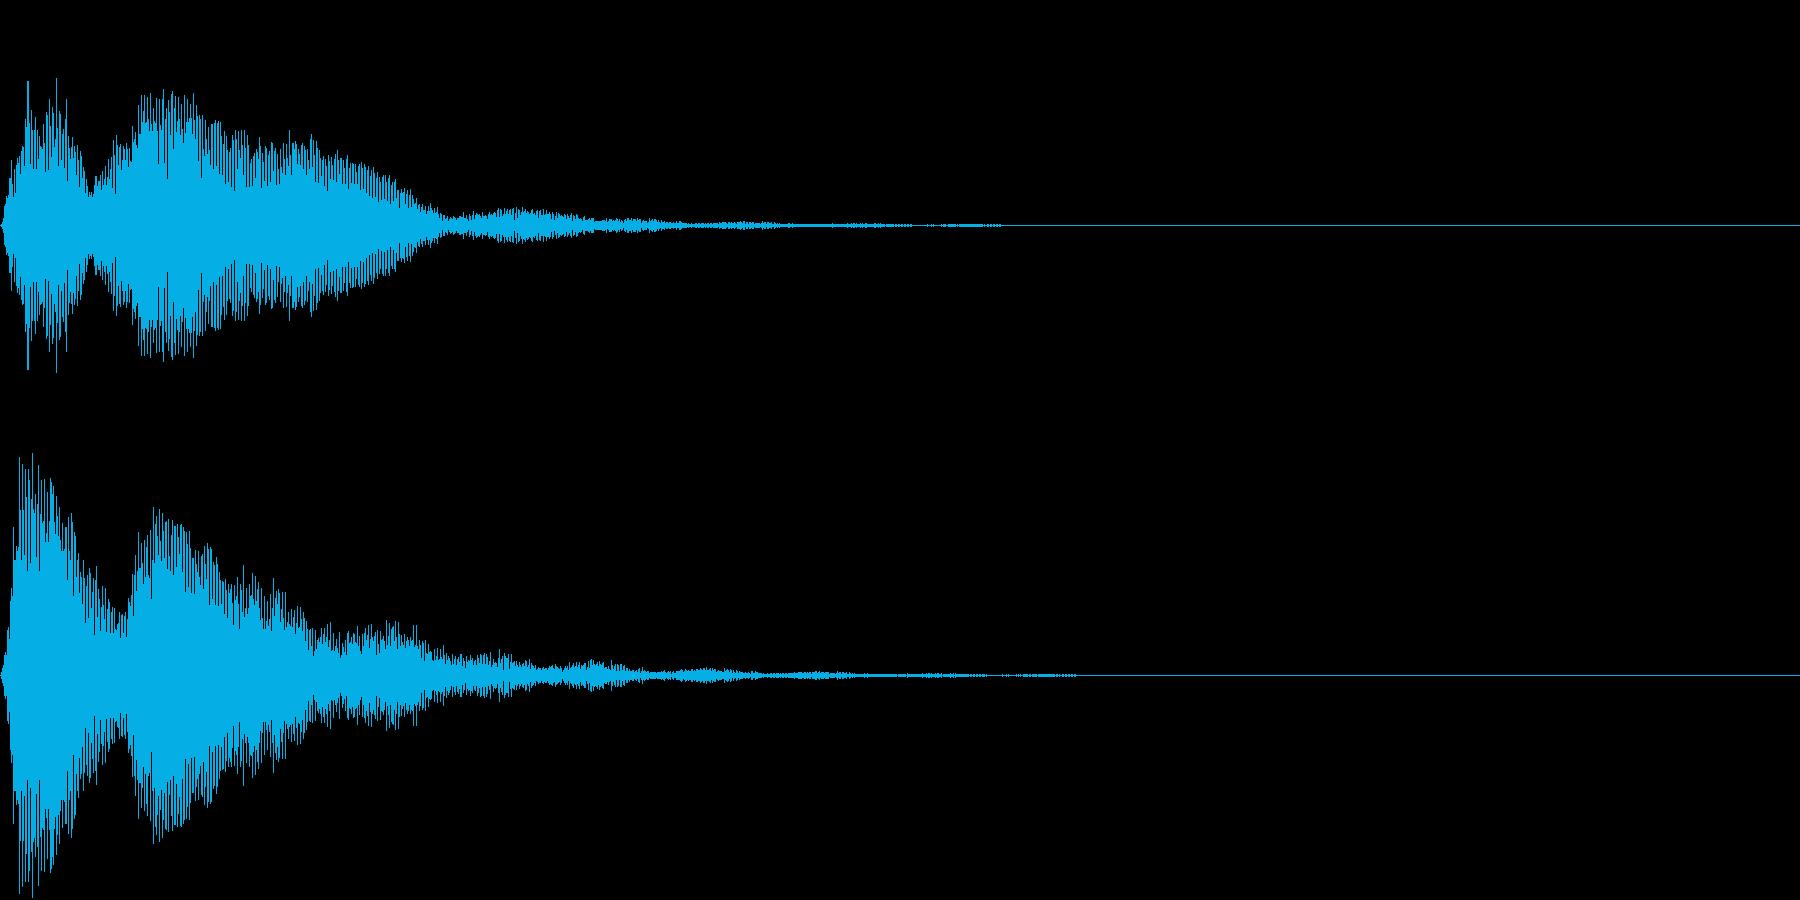 SF CinemaFX ダークなサウンドの再生済みの波形